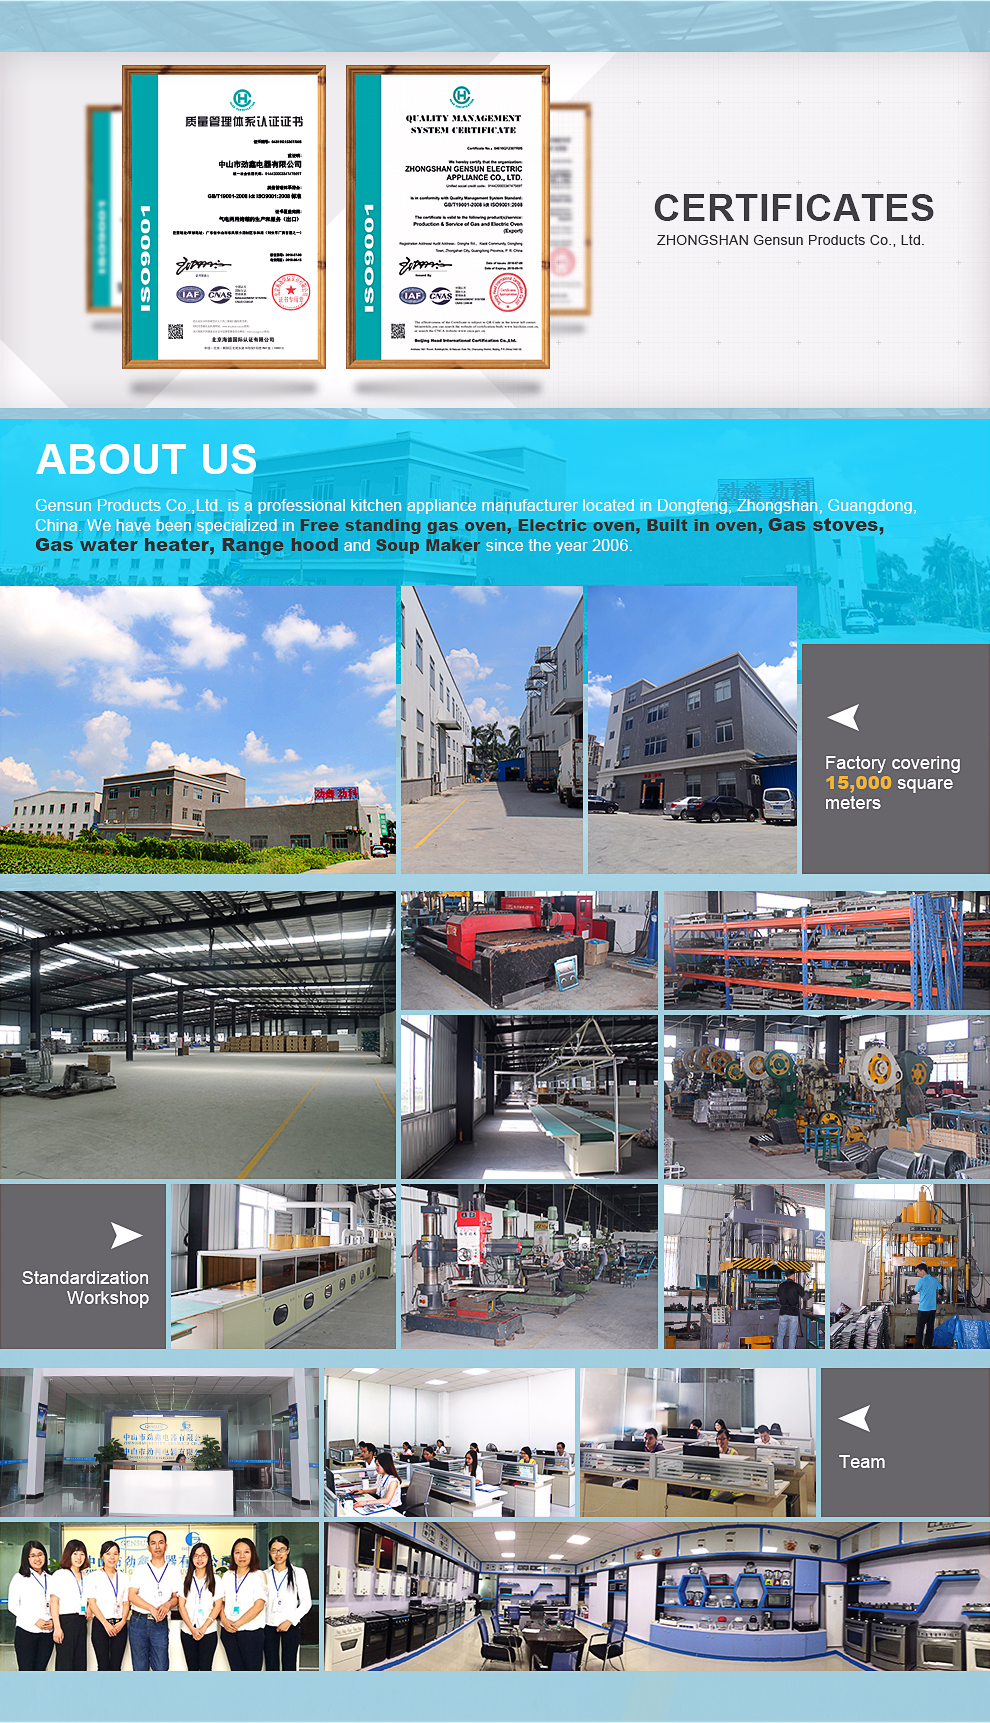 Zhongshan Gensun Electric Appliance Co Ltd Free standing oven